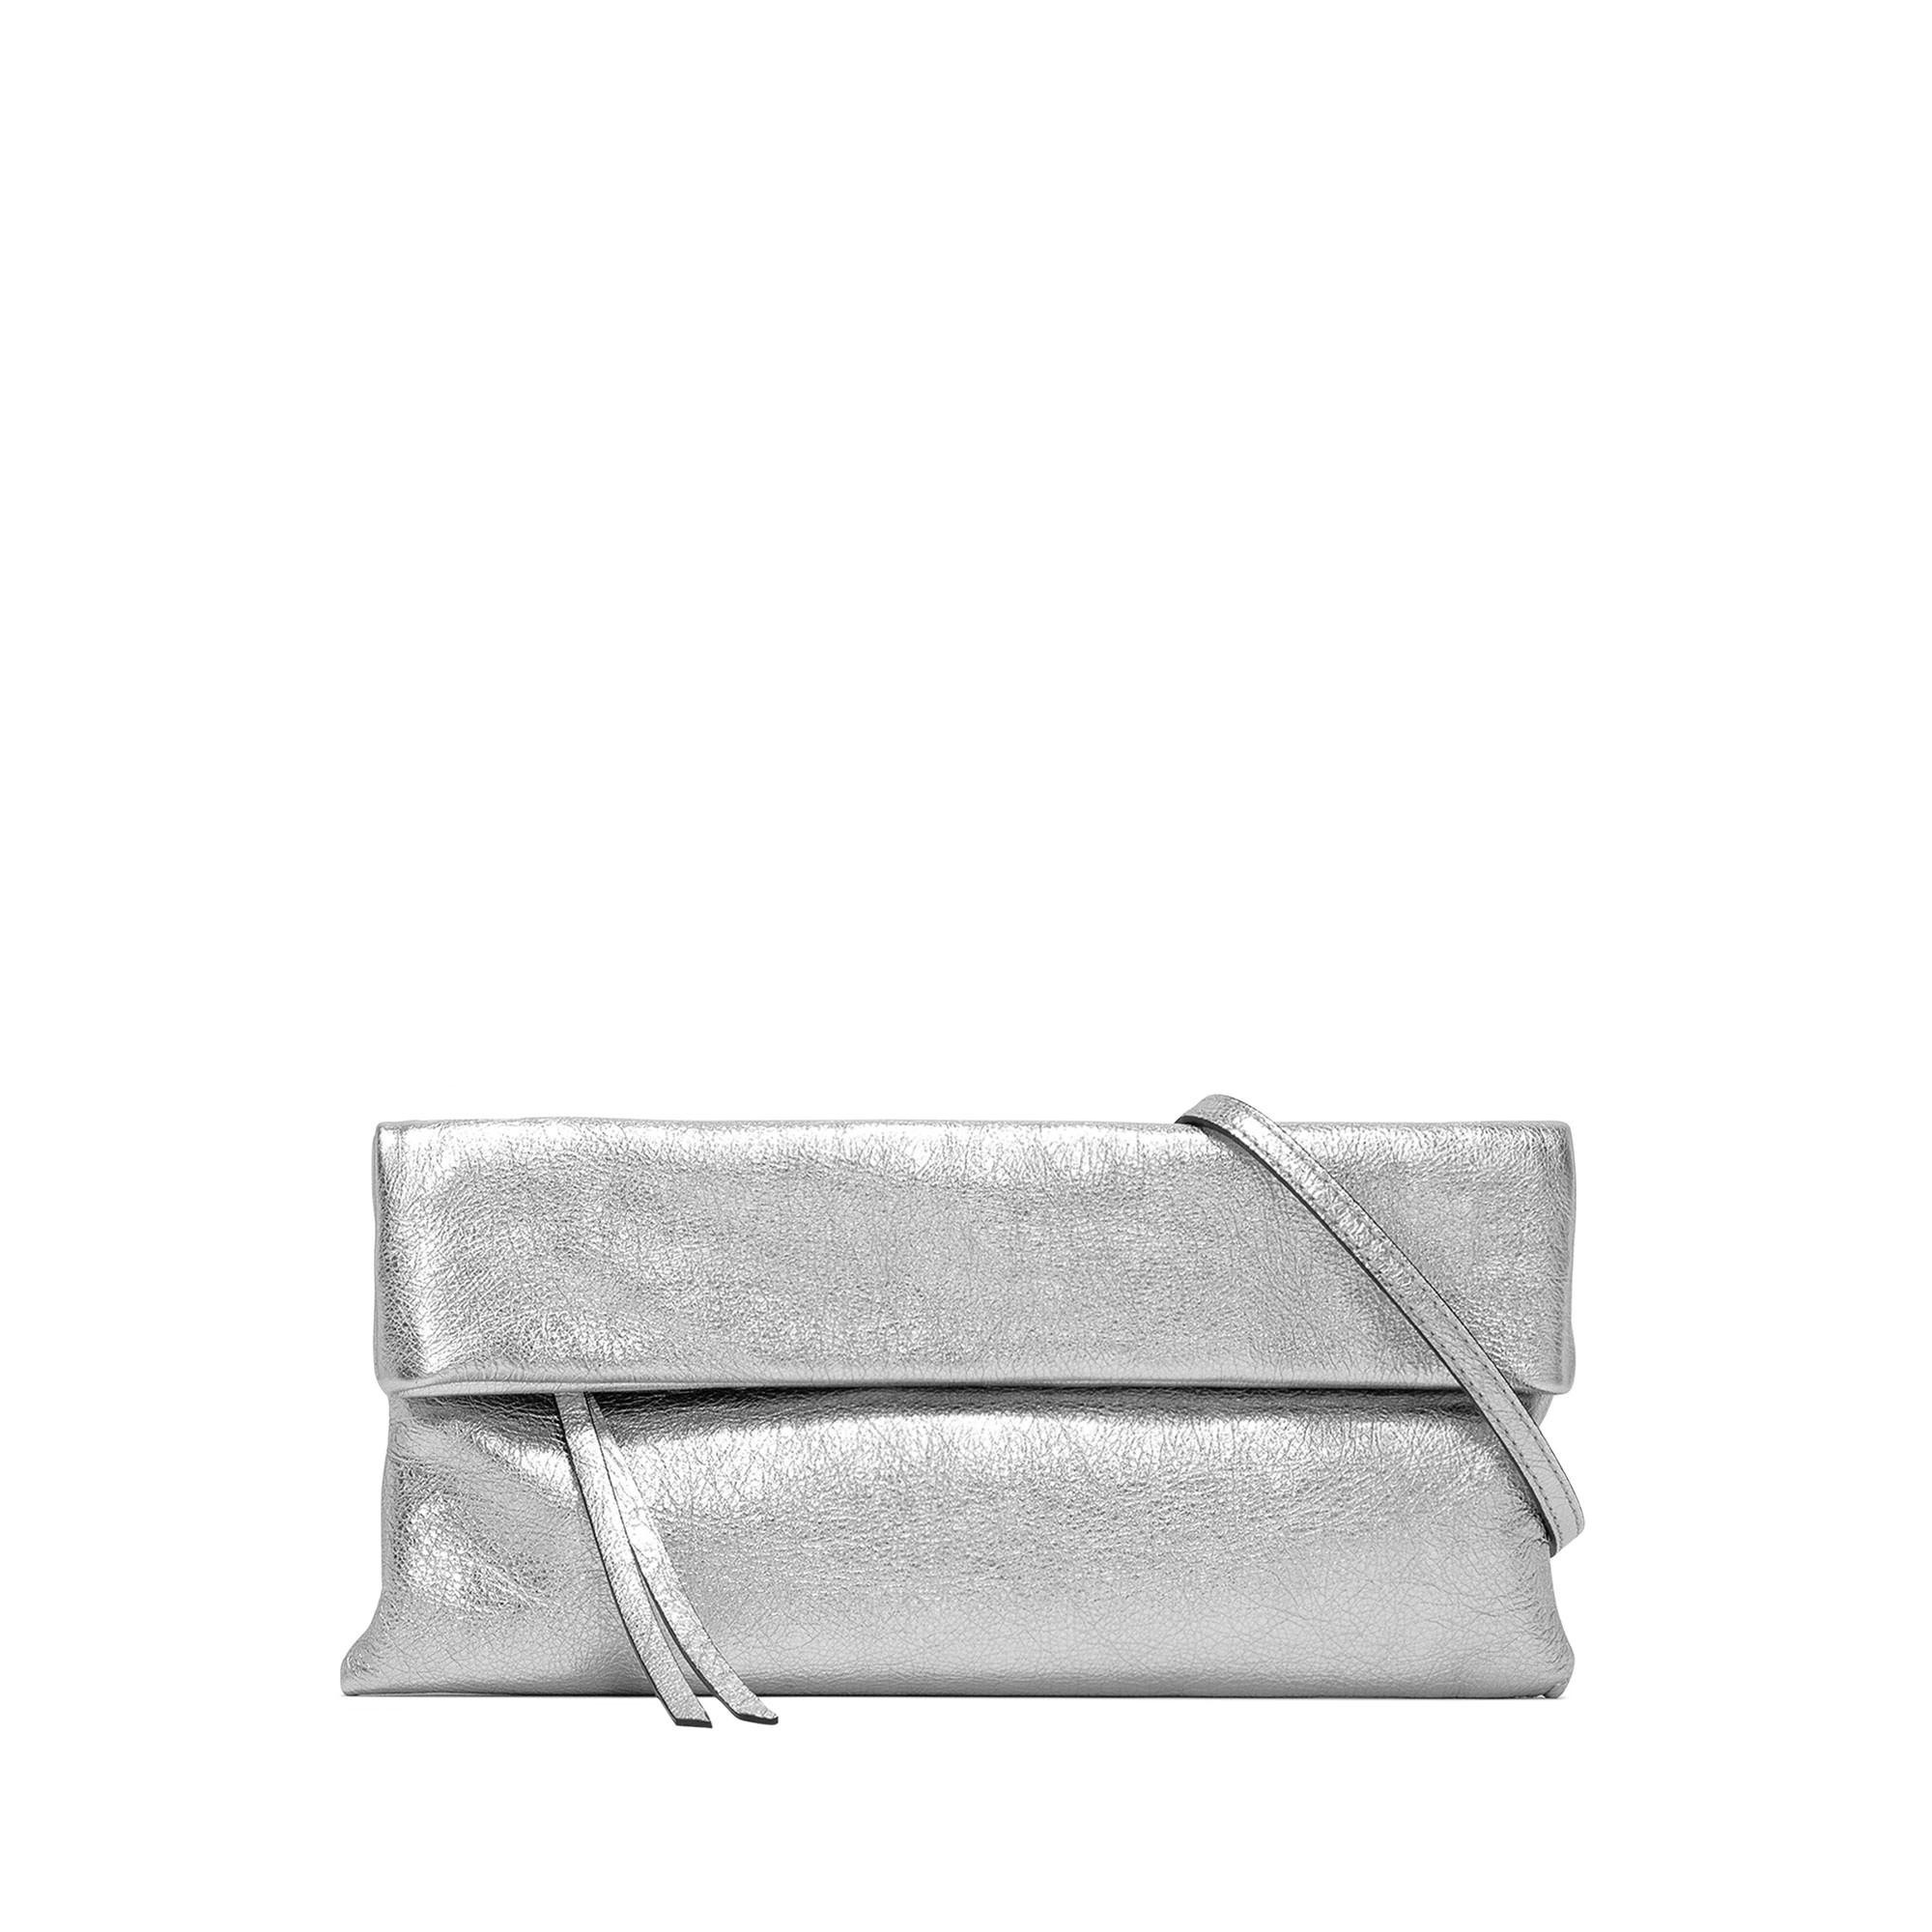 Borsa in pelle Cherry, Grigio argento, large image number 0